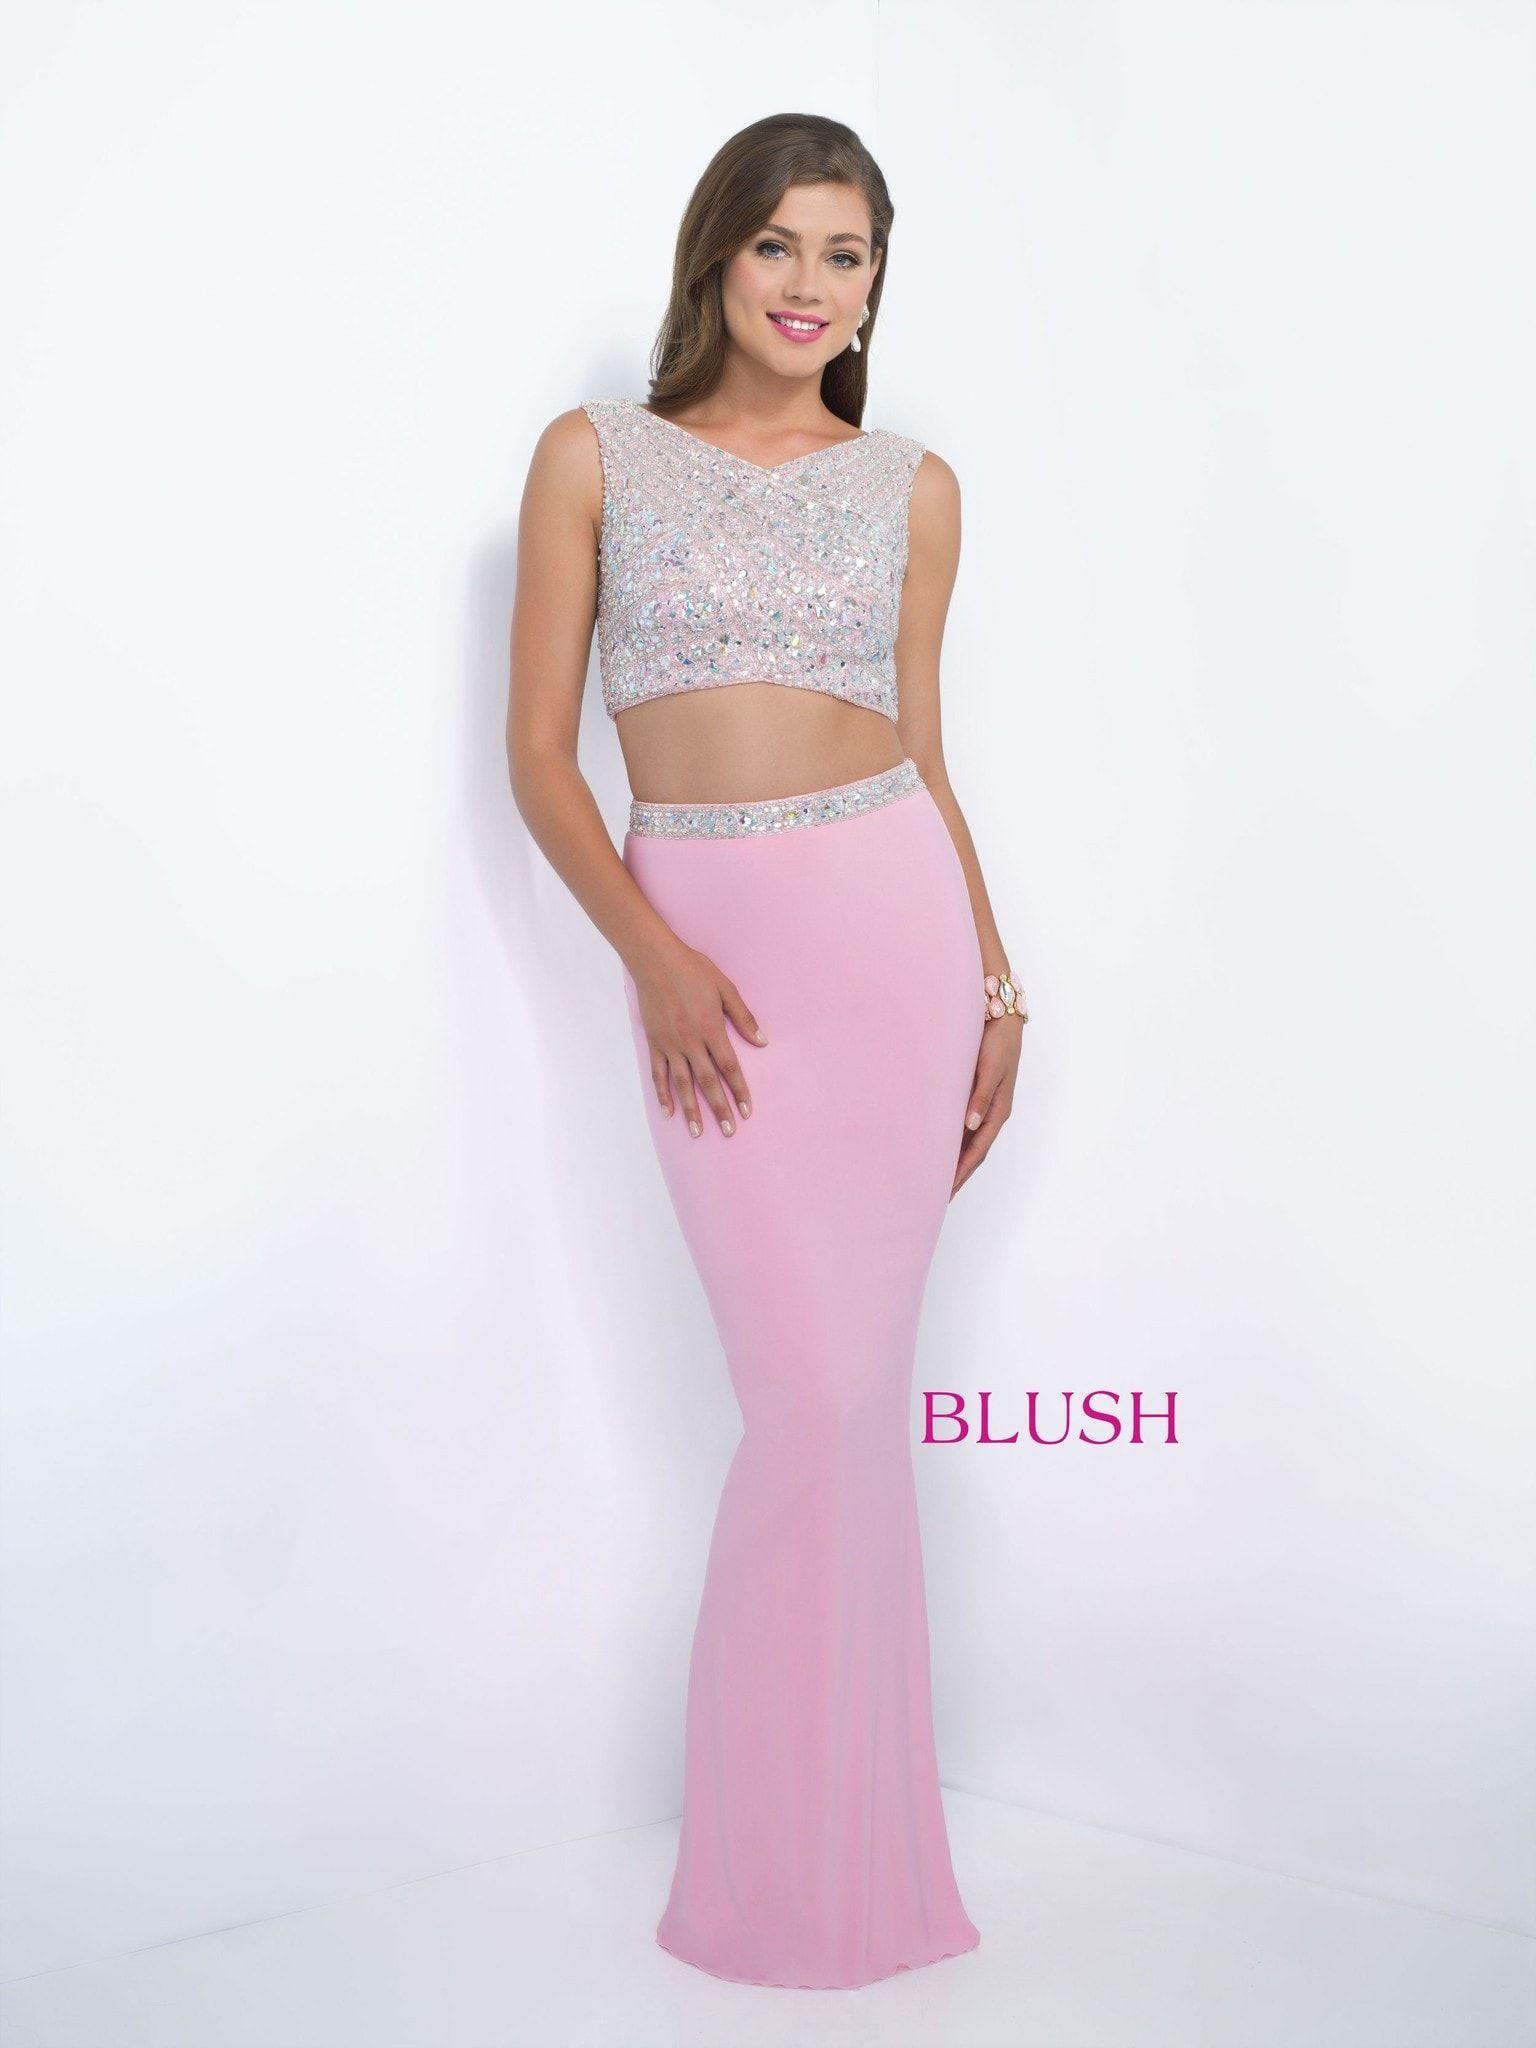 Blush prom bubblegum products pinterest blush prom prom